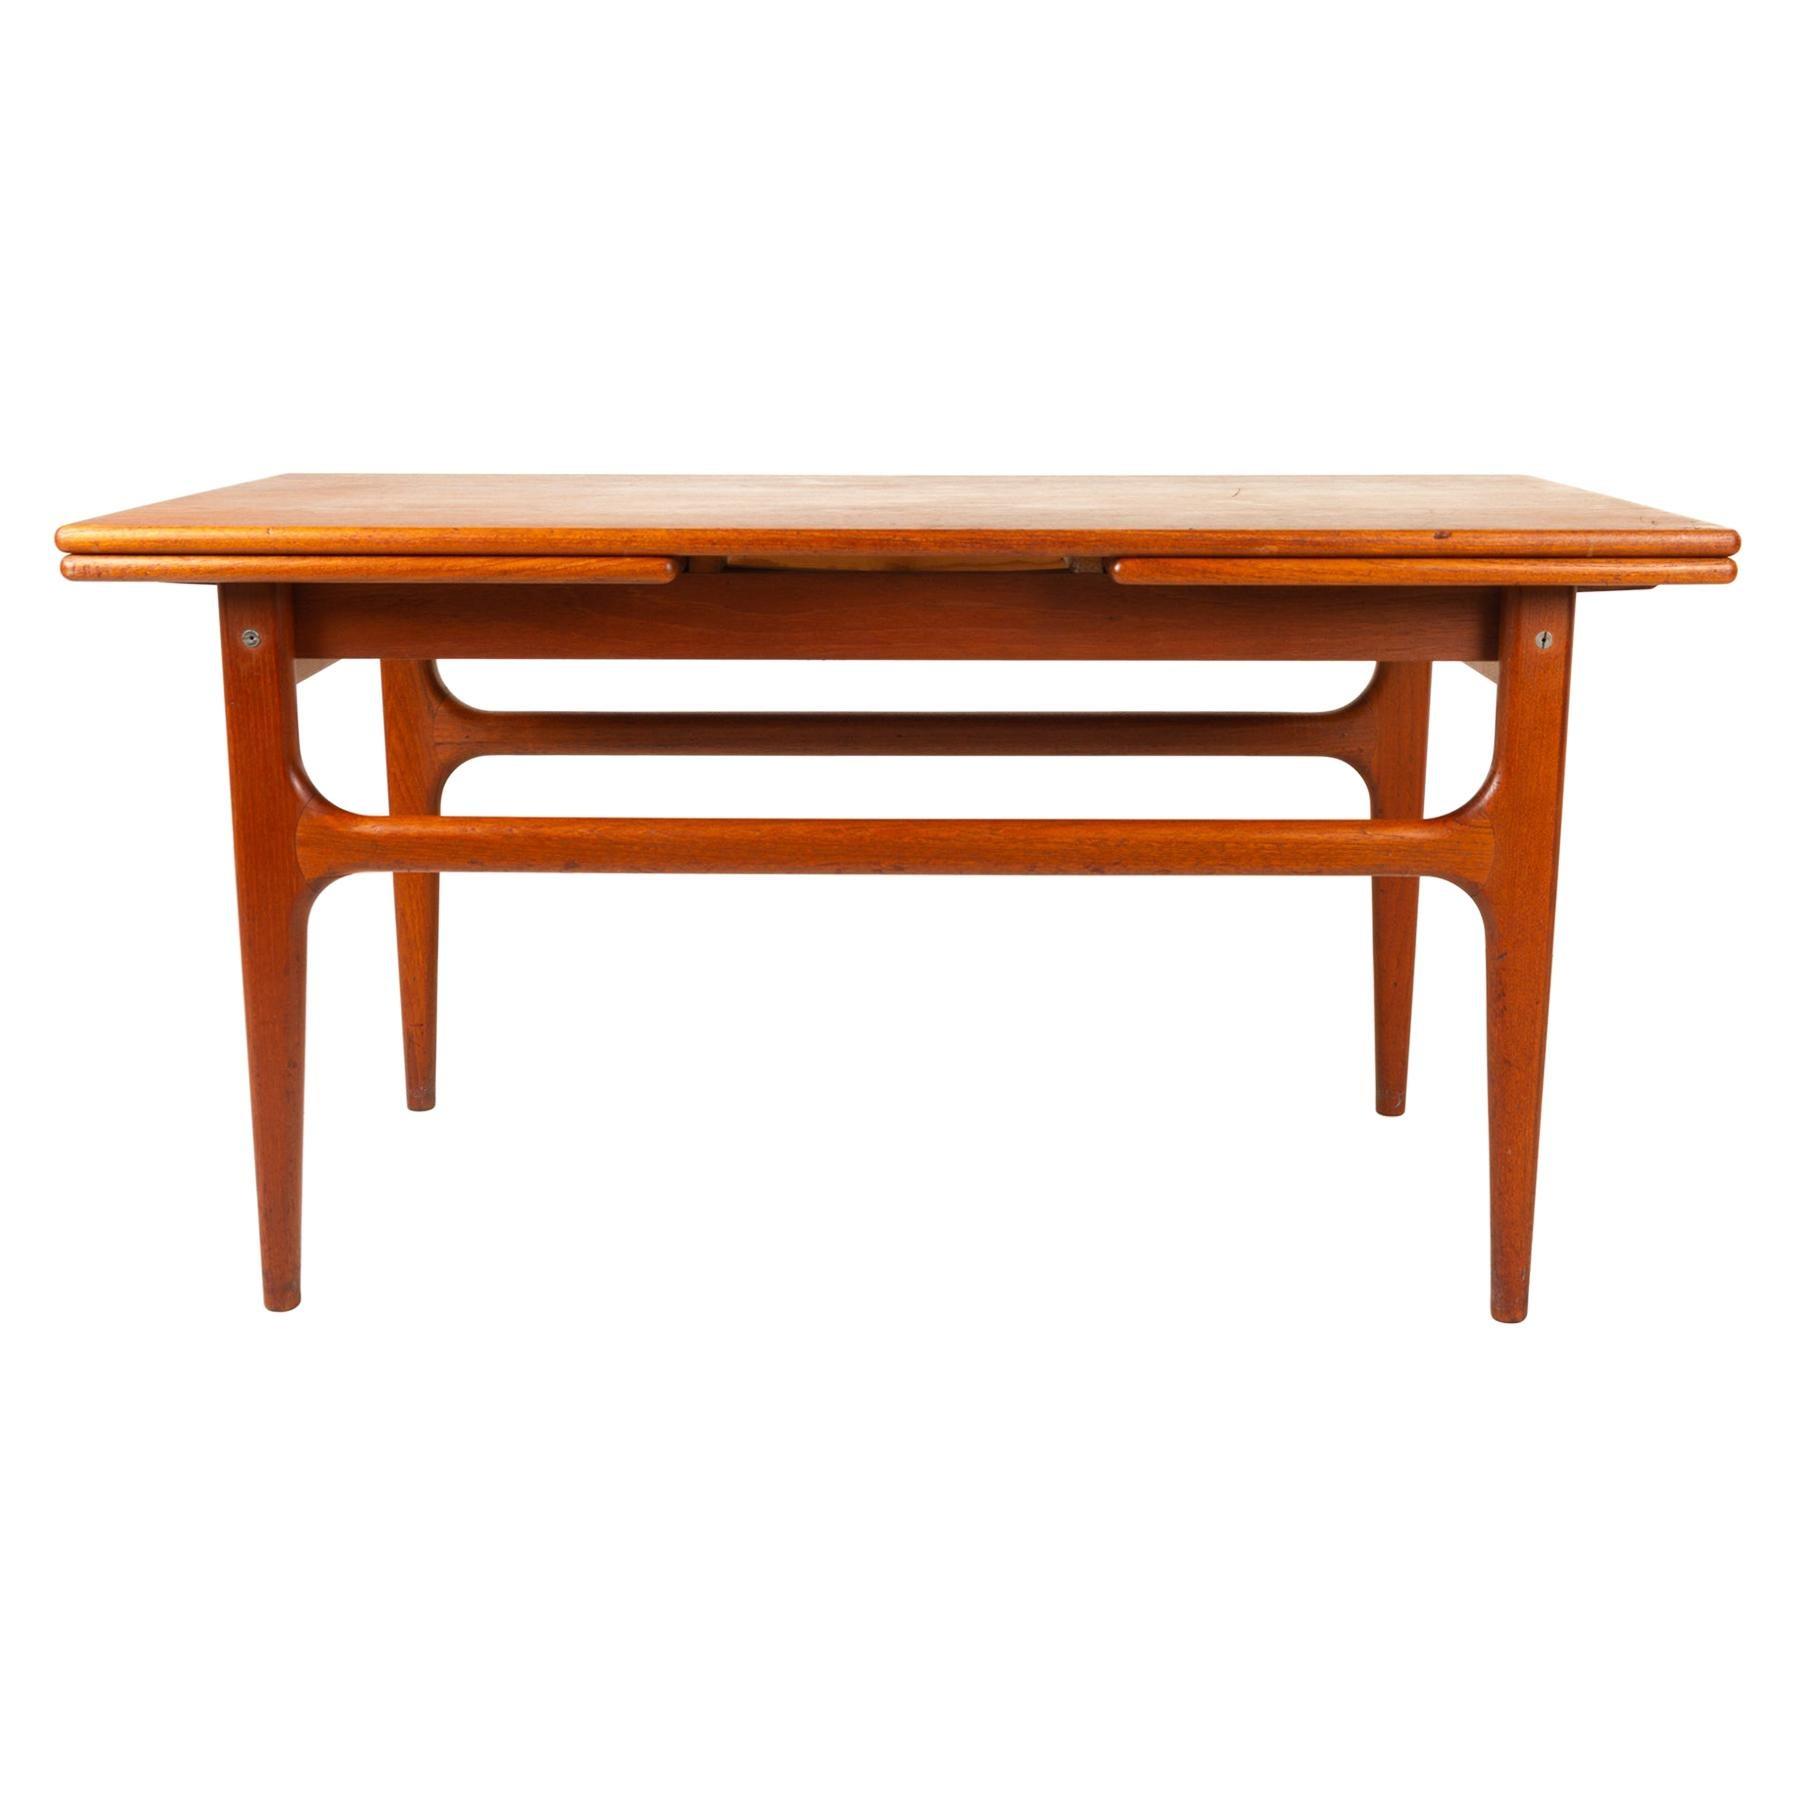 Vintage Danish Extendable Teak Coffee Table by Trioh, 1960s